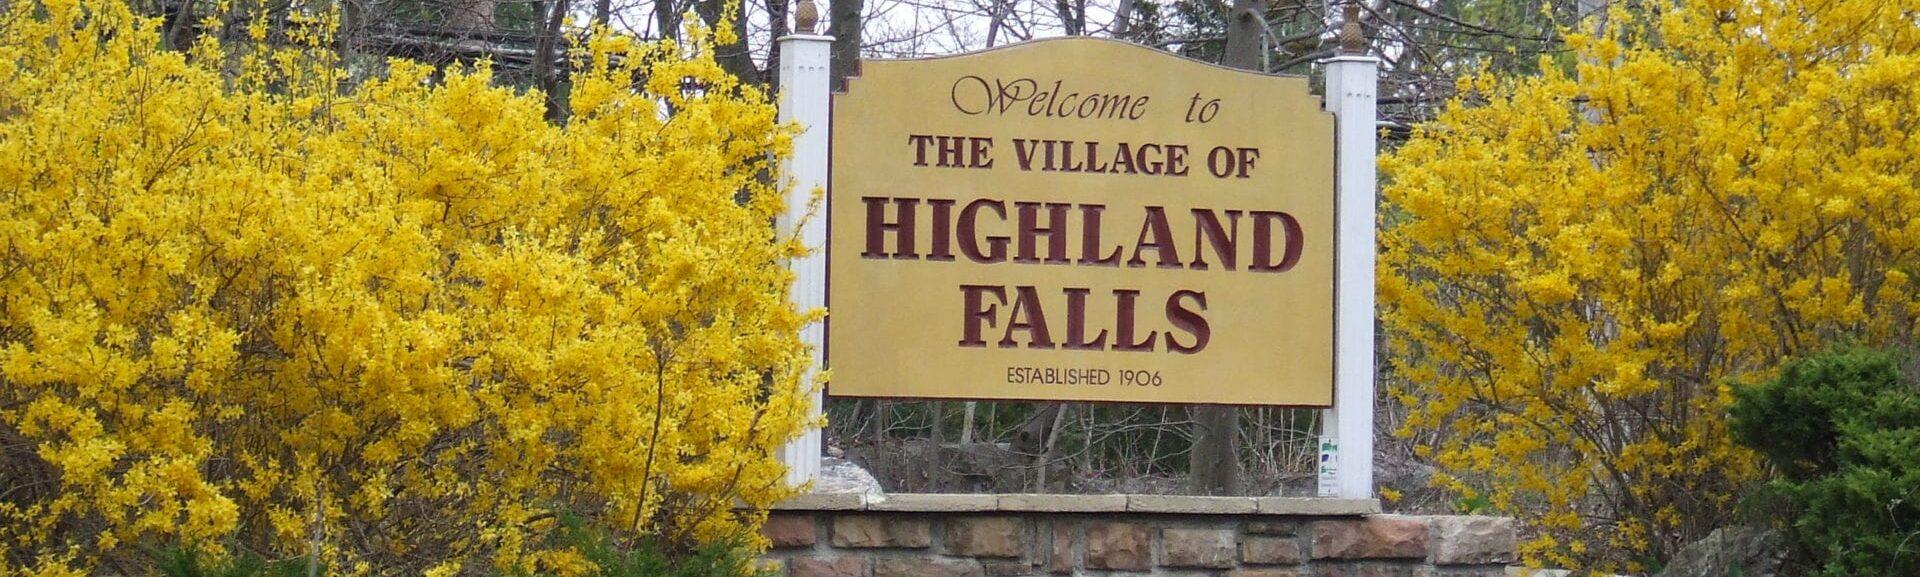 Village of Highland Falls